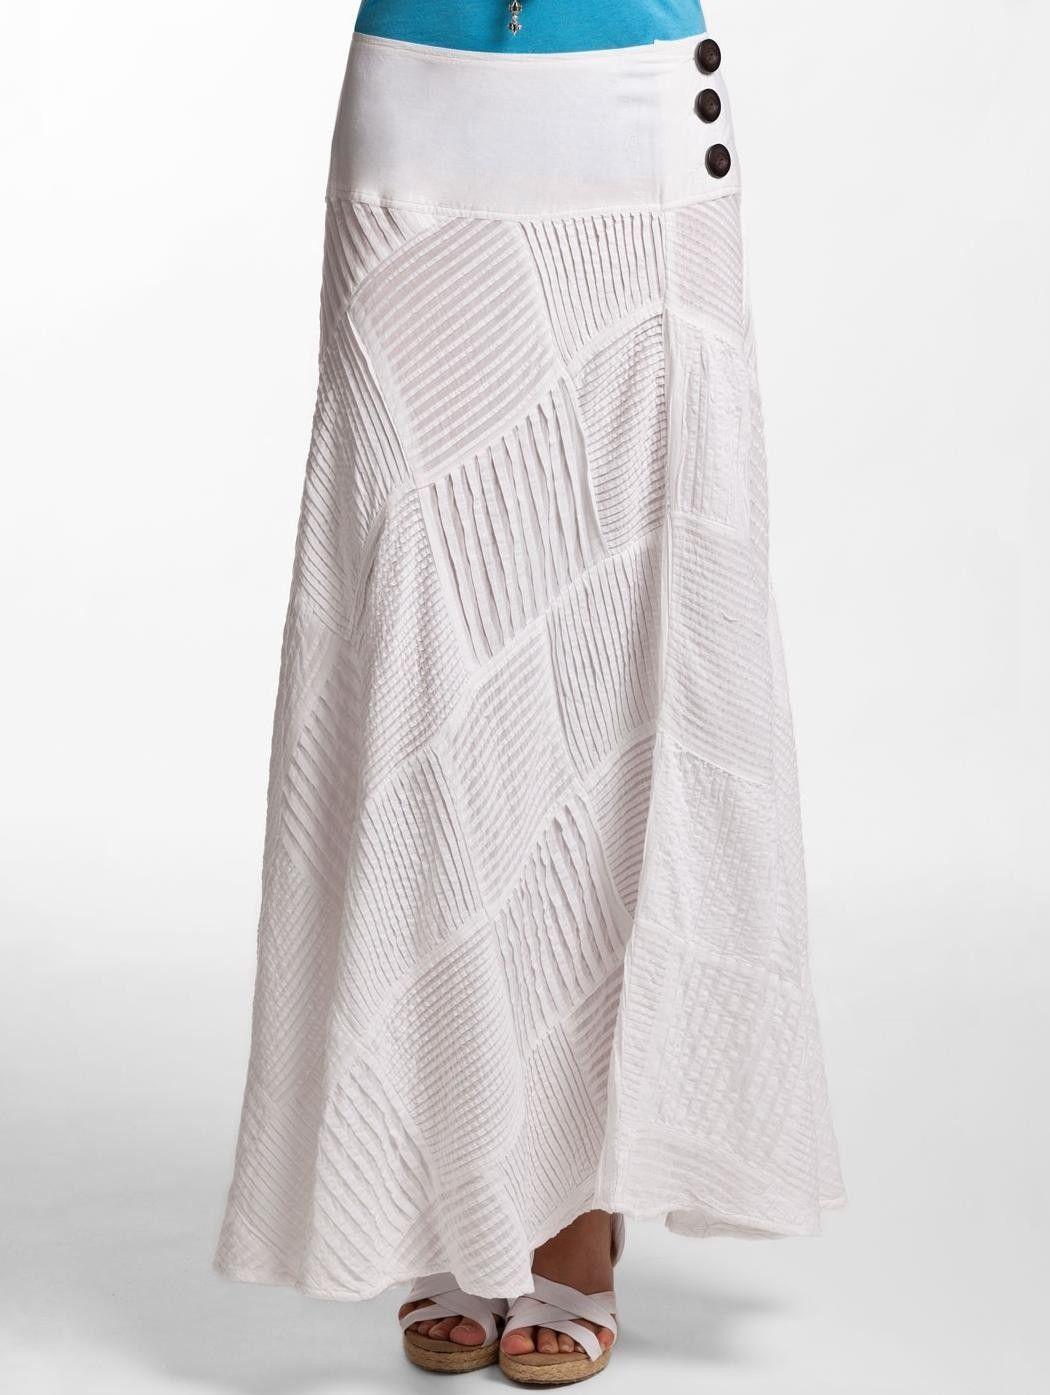 beach resort wear for women Beach Slumber Skirt, Long